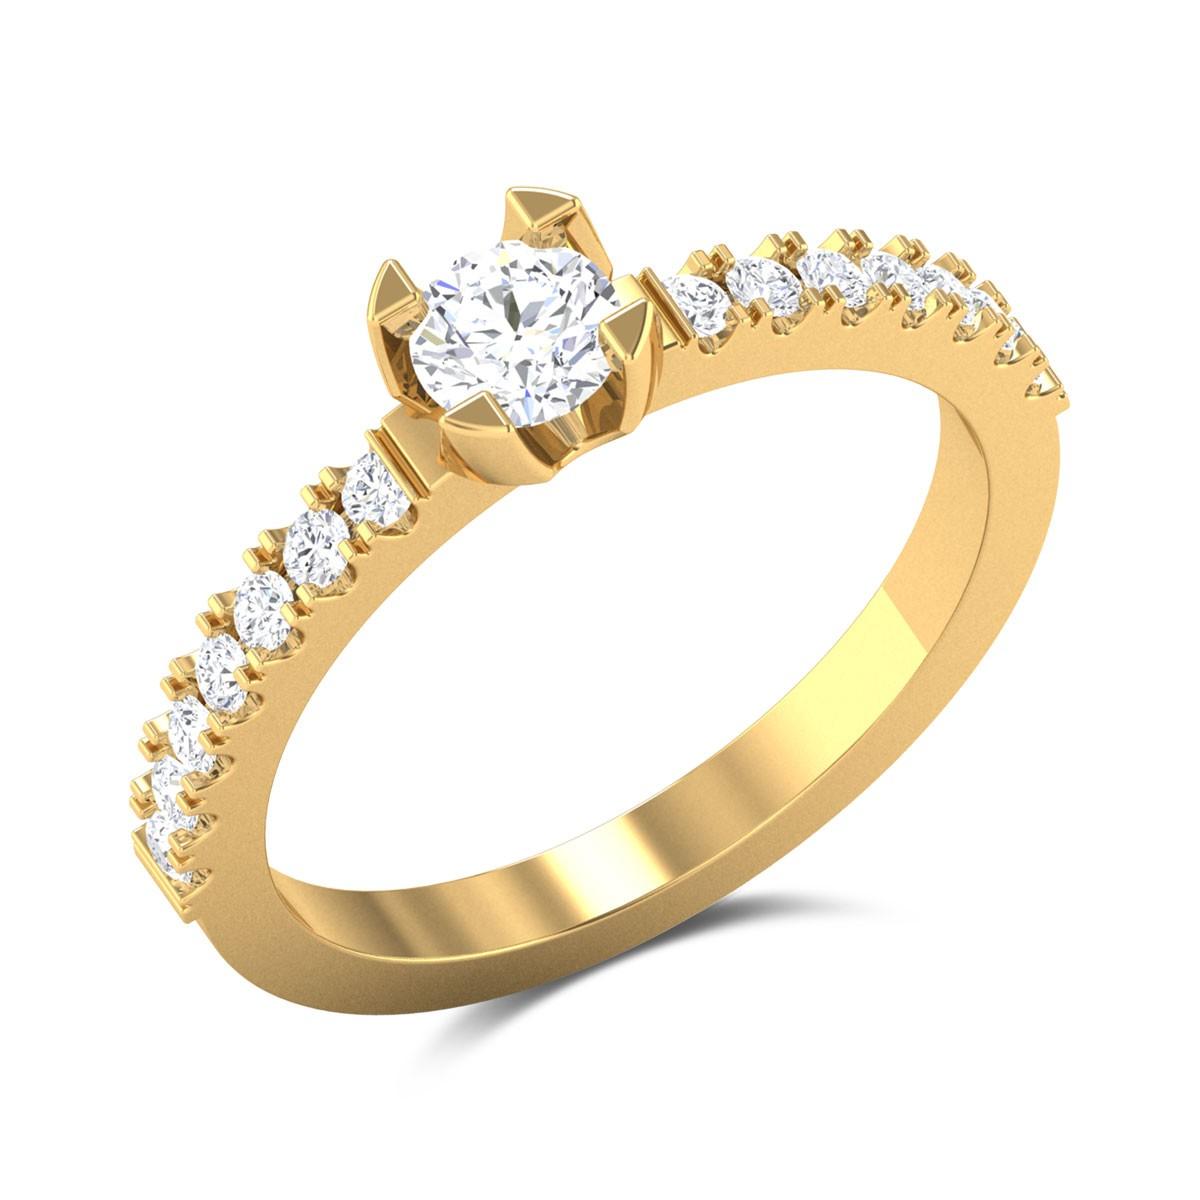 Lauretta Diamond 4 Prong Solitaire Ring